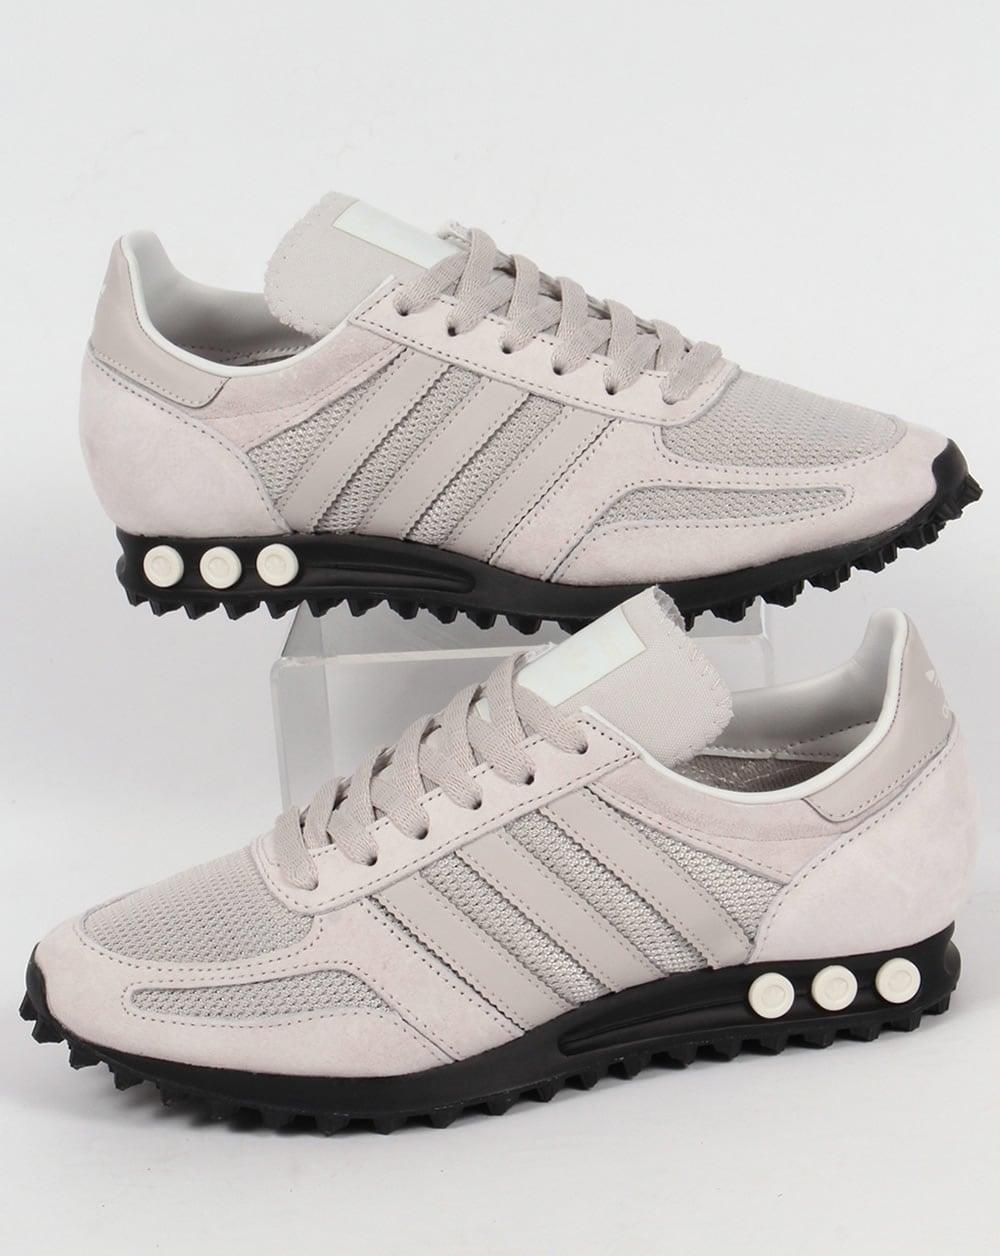 Adidas LA Trainer OG Pearl Grey,shoes